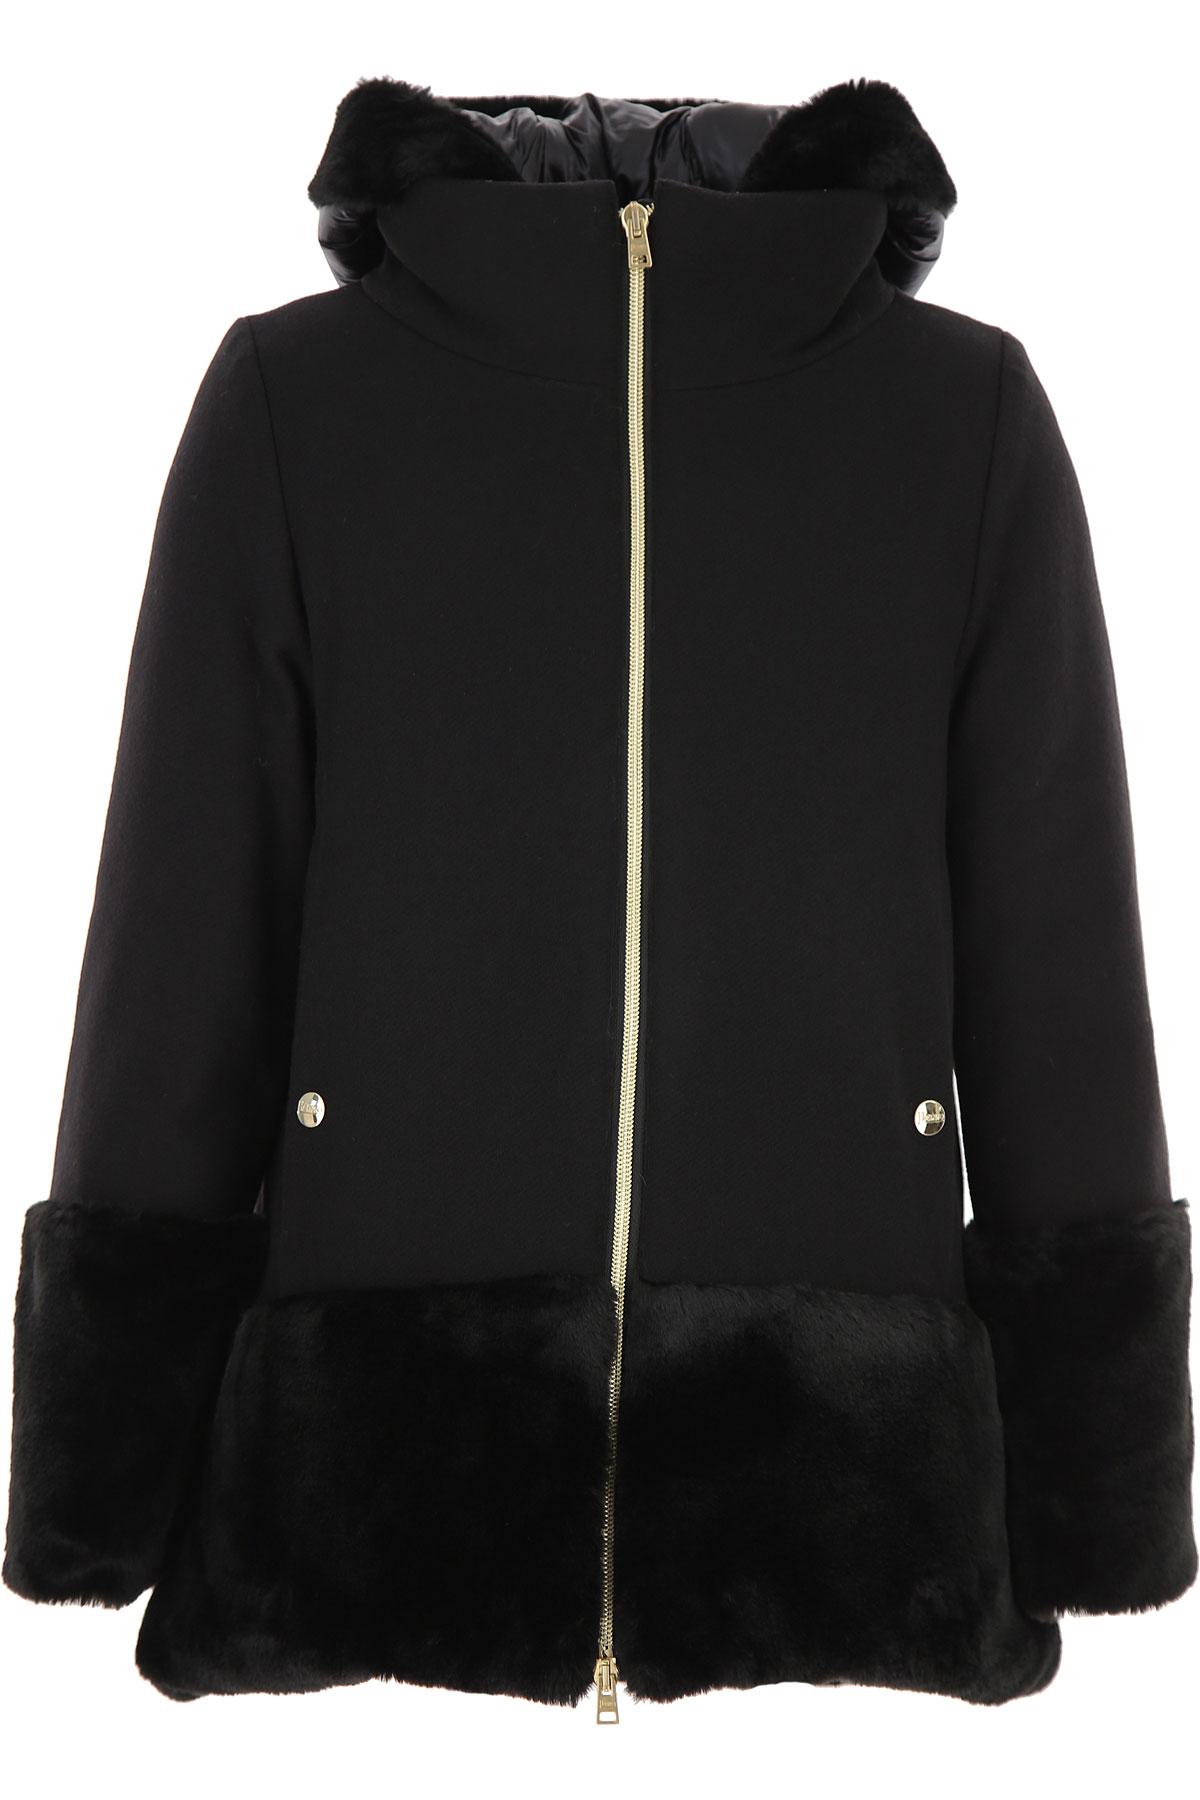 Herno {DESIGNER} Kids Coat for Girls On Sale, Black, Wool, 2019, 10Y 8Y